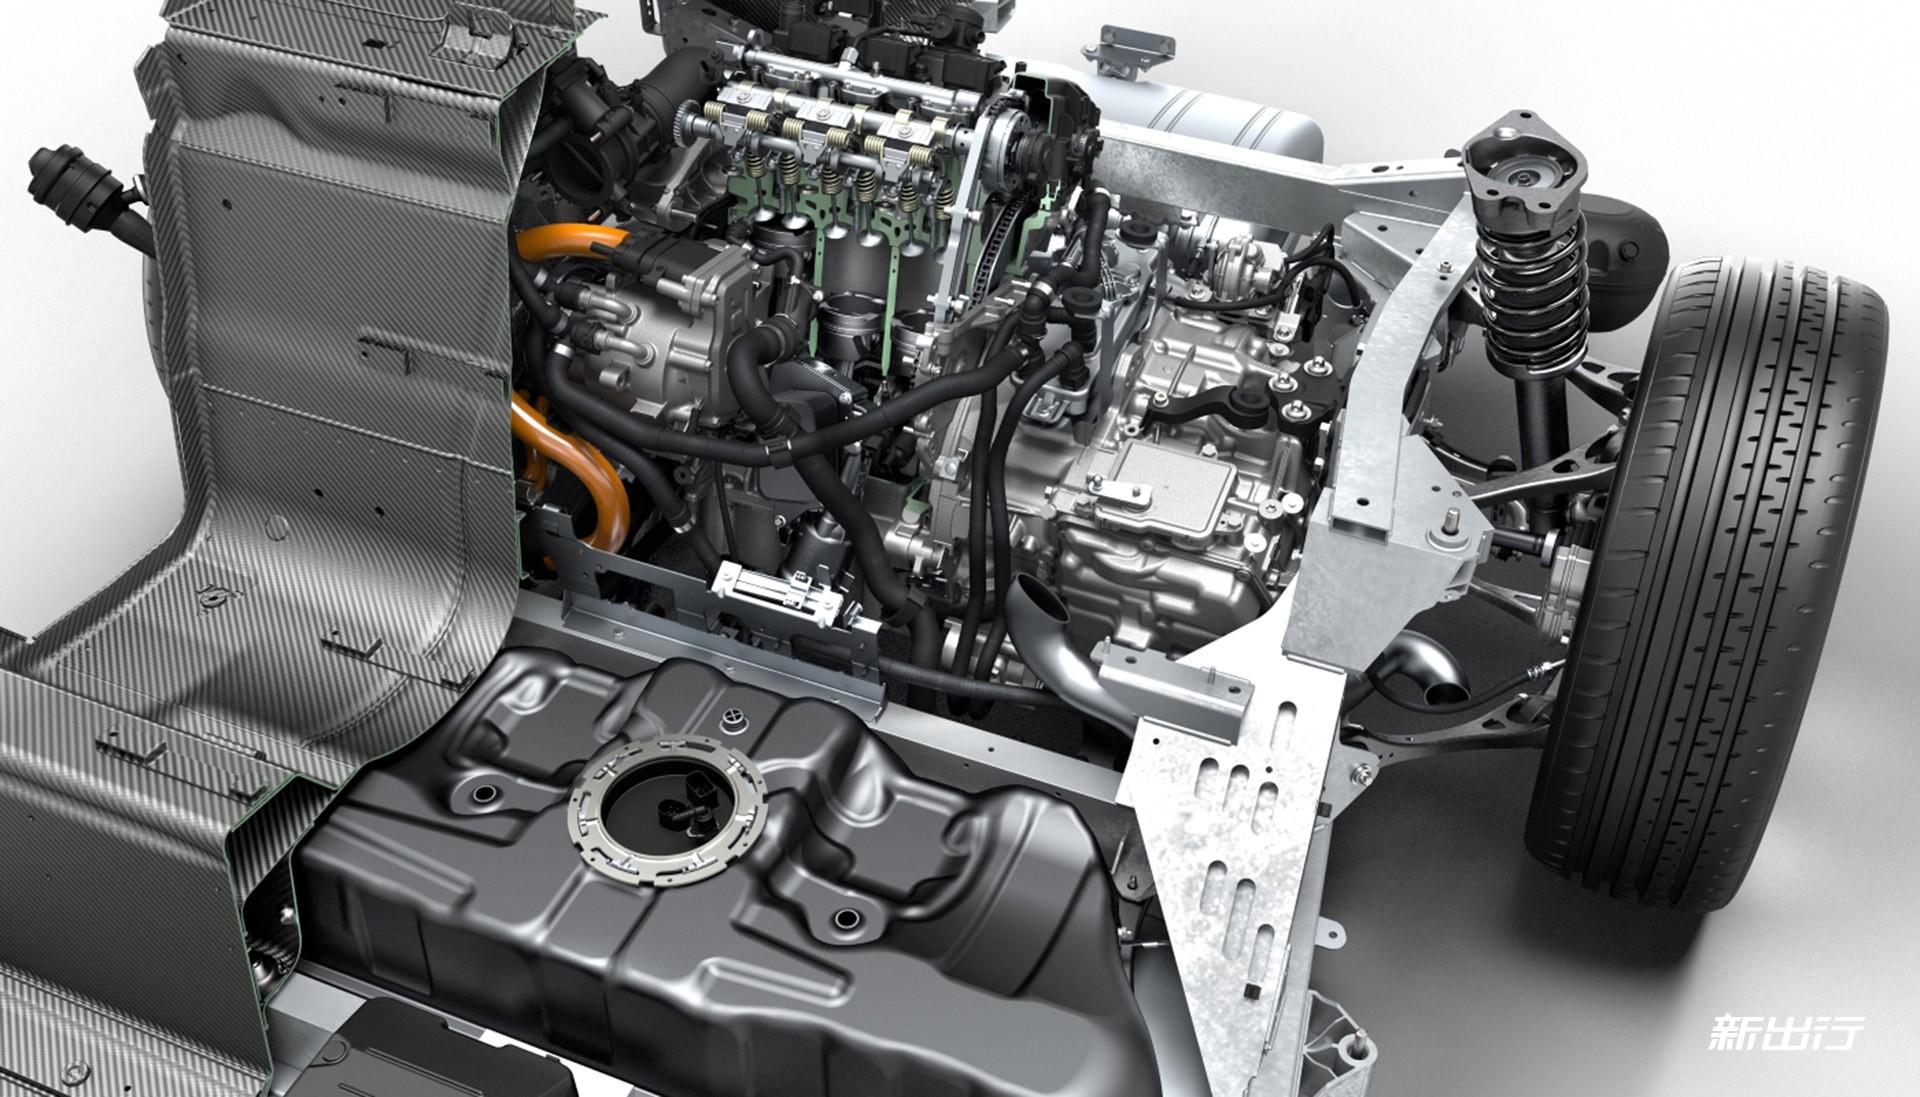 0l 级别:保时捷 2.0t 水平对置发动机